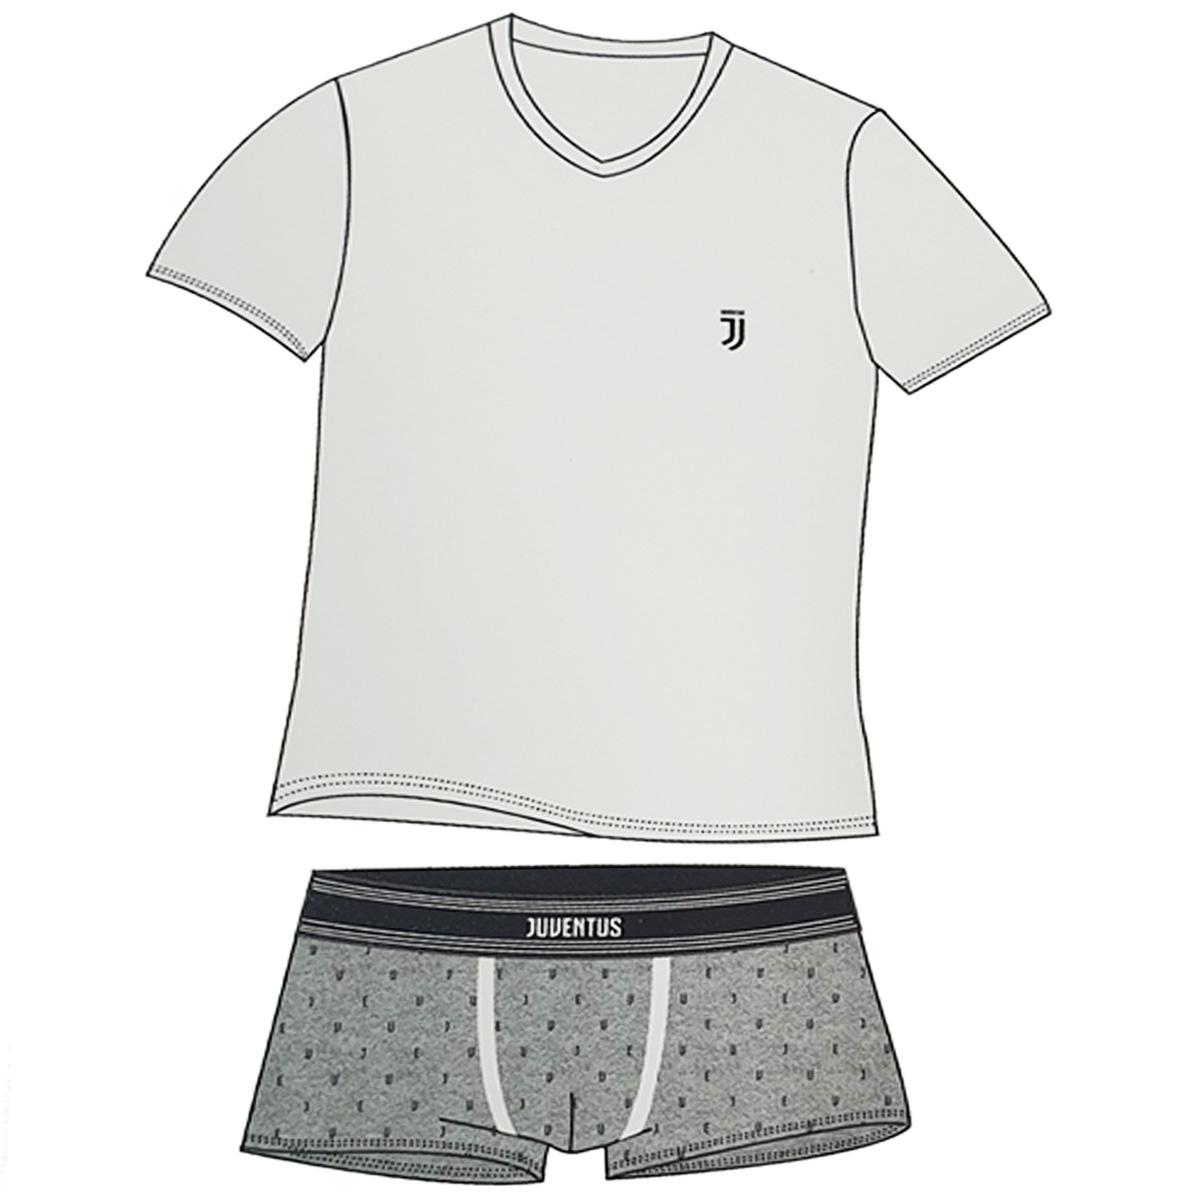 Boxer A.C Milan Completo Intimo Set T-Shirt Prodotto Ufficiale